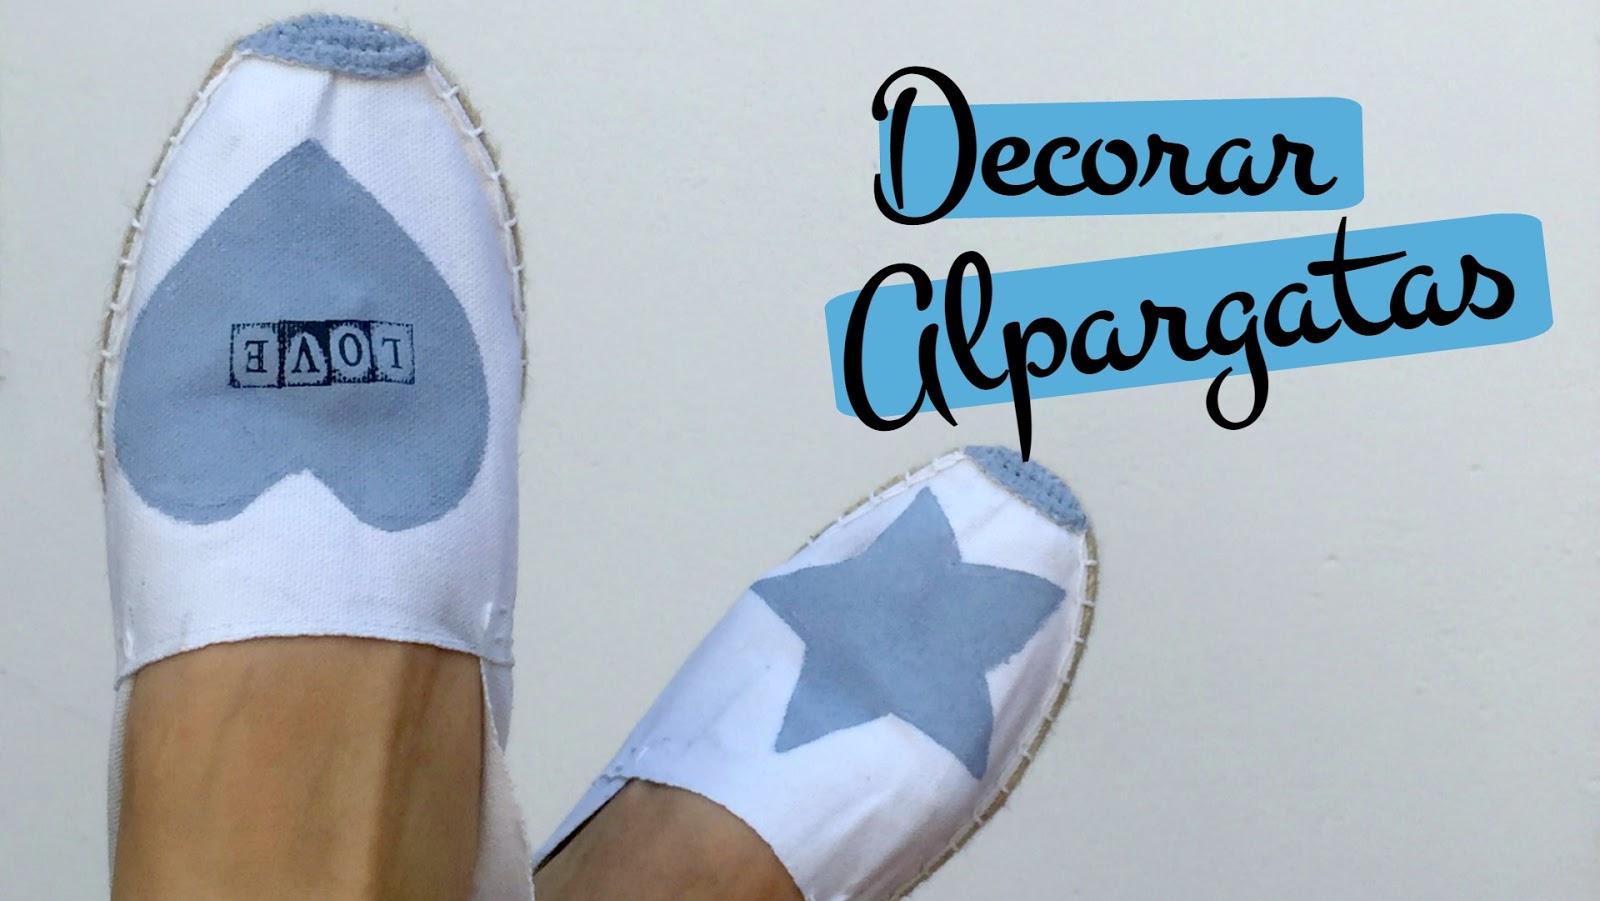 Pinafili pinafili films decorar zapatillas de esparto o alpargatas - Alpargatas de esparto ...